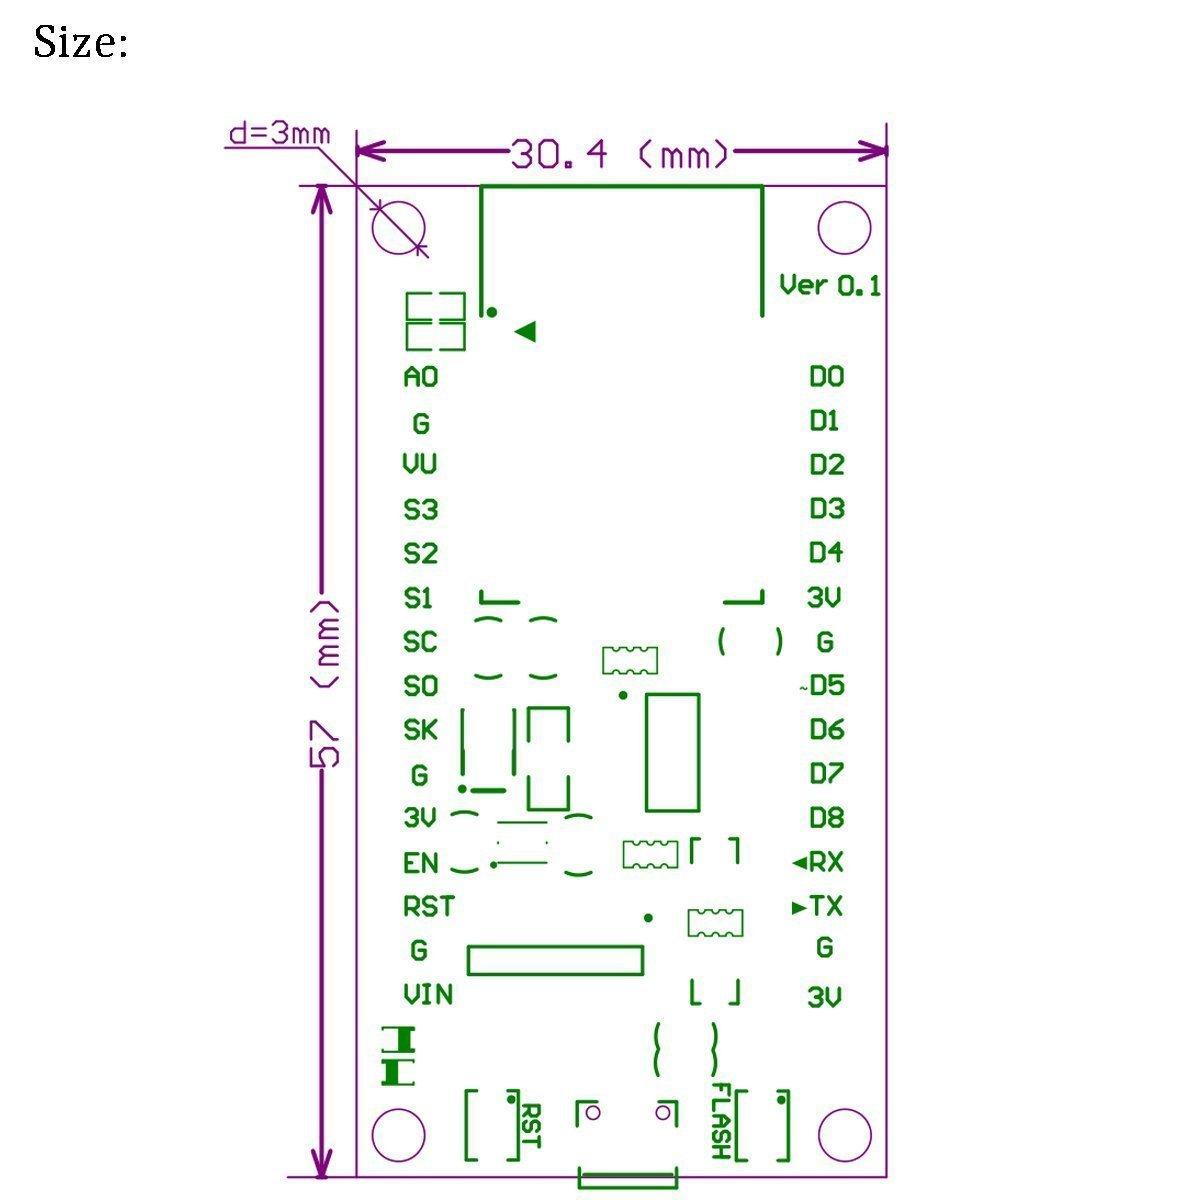 MakerFocus 2pcs ESP8266 NodeMcu Serial Wireless Arduino Wifi Module CH340 NodeMcu Arduino V3 Lua WIFI IOT Development New Version Esp8266 Development Board For Arduino Project by MakerFocus (Image #5)